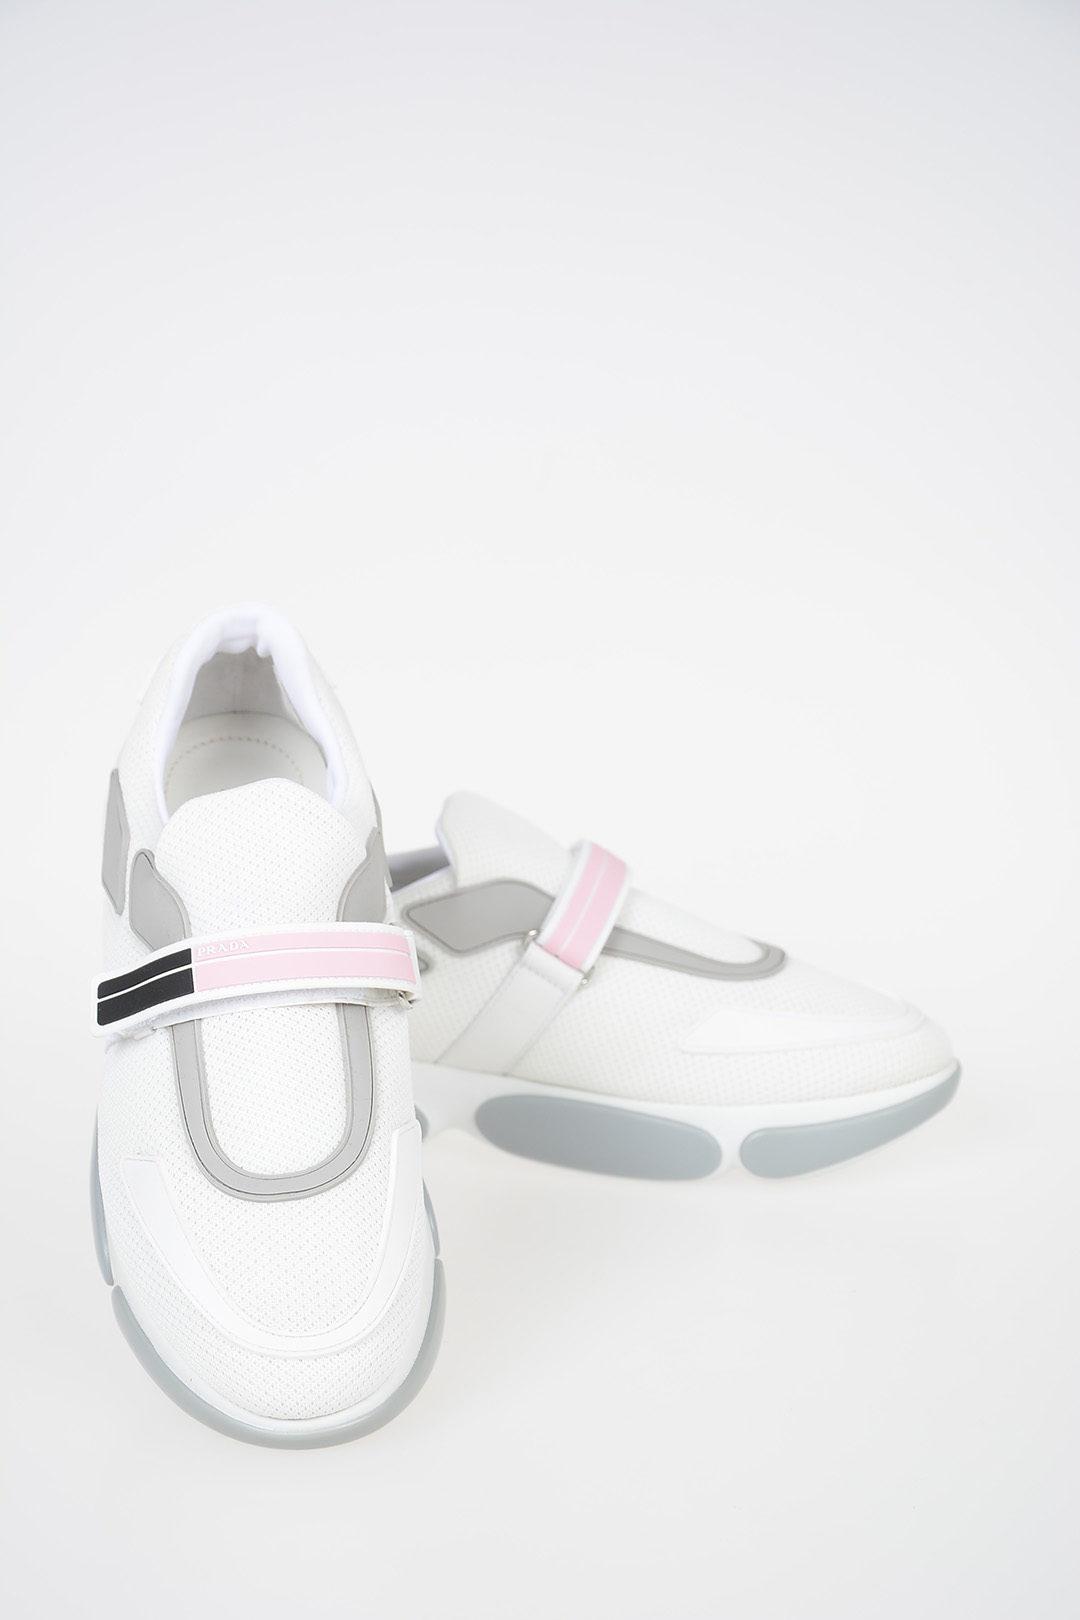 Prada Low Sneakers with Velcro Closure